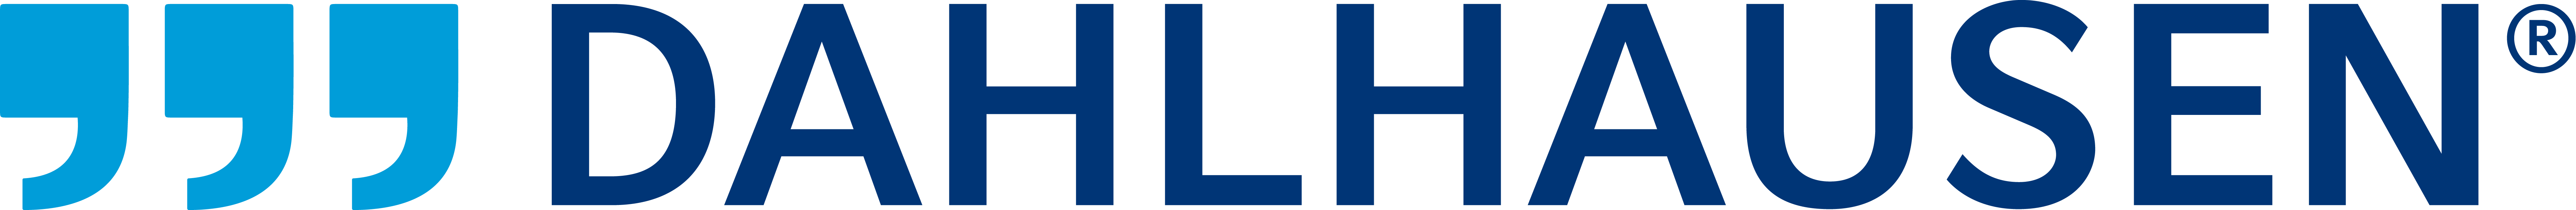 Logo P. J. Dahlhausen & Co. GmbH